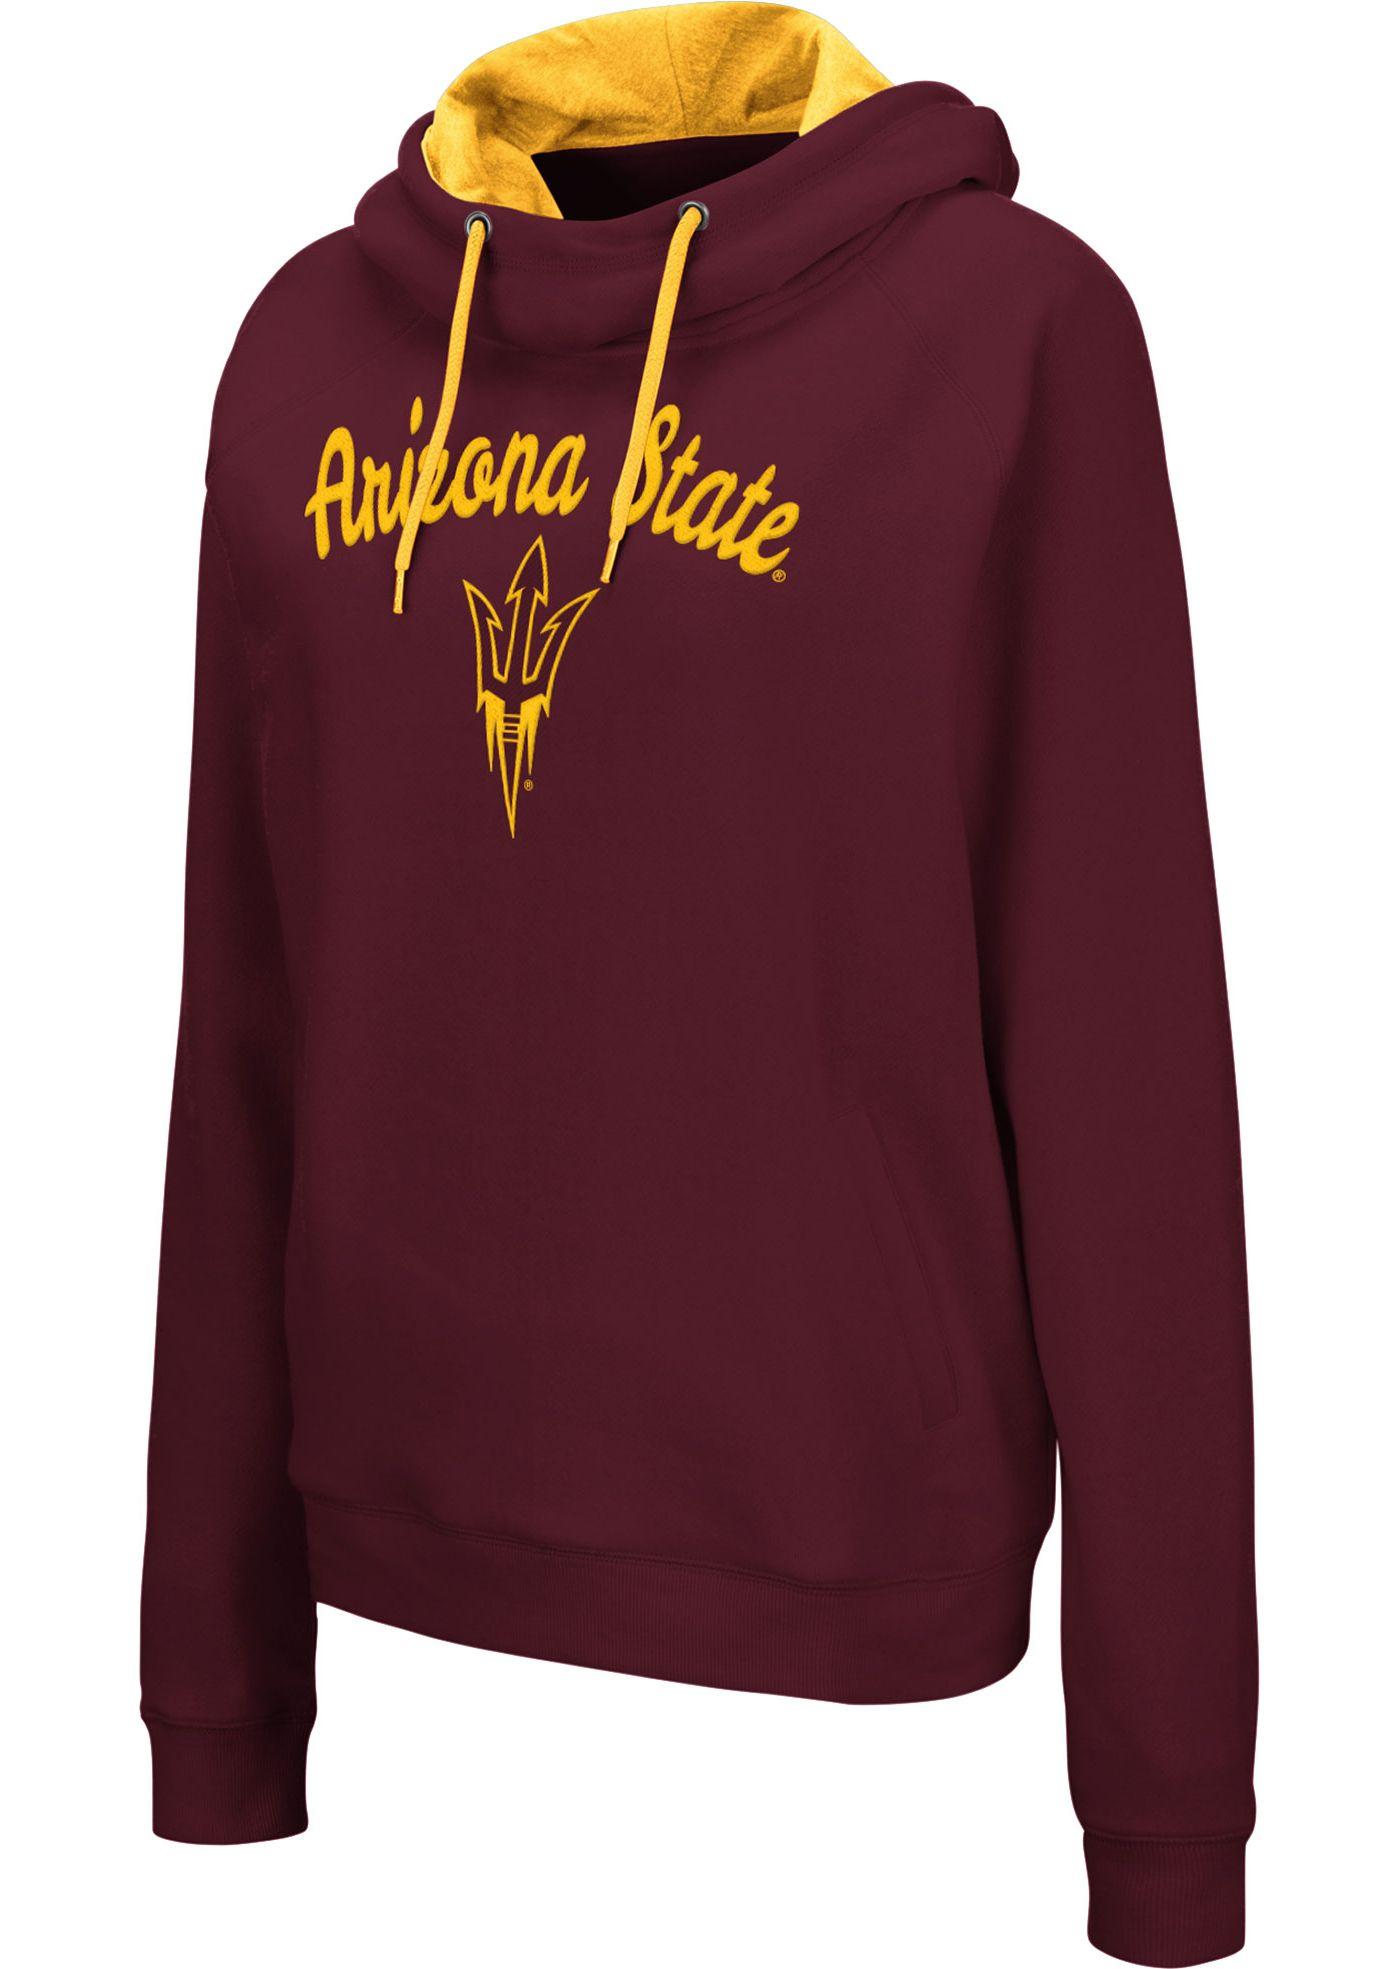 Colosseum Women's Arizona State Sun Devils Maroon Louise Pullover Sweatshirt